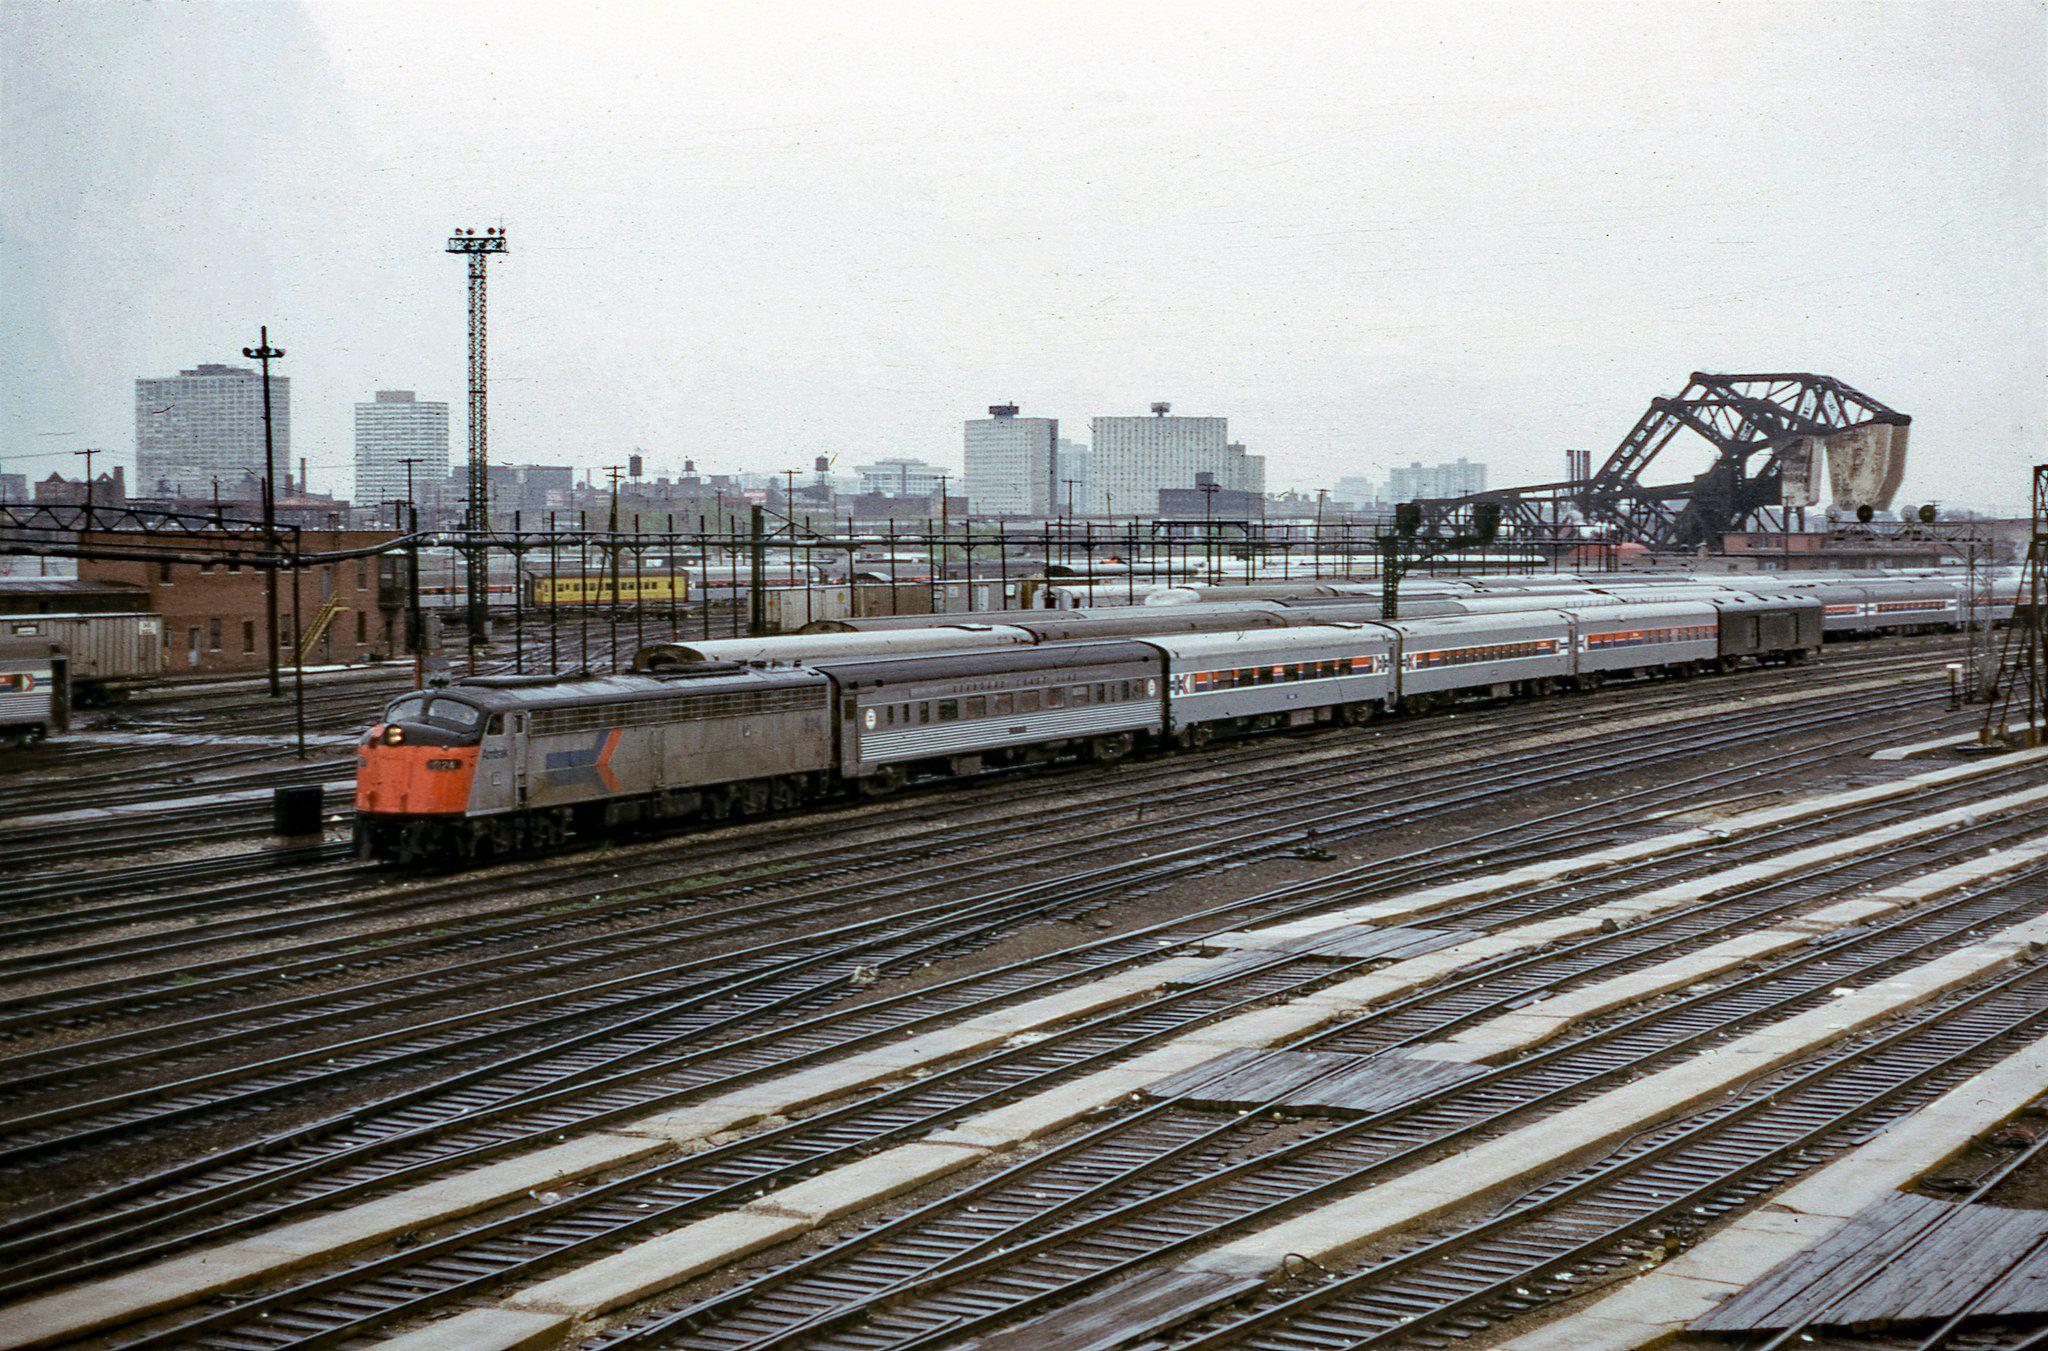 Amtrak 324 Roosevelt Road 5 1974 Mb Amtrak New York Central